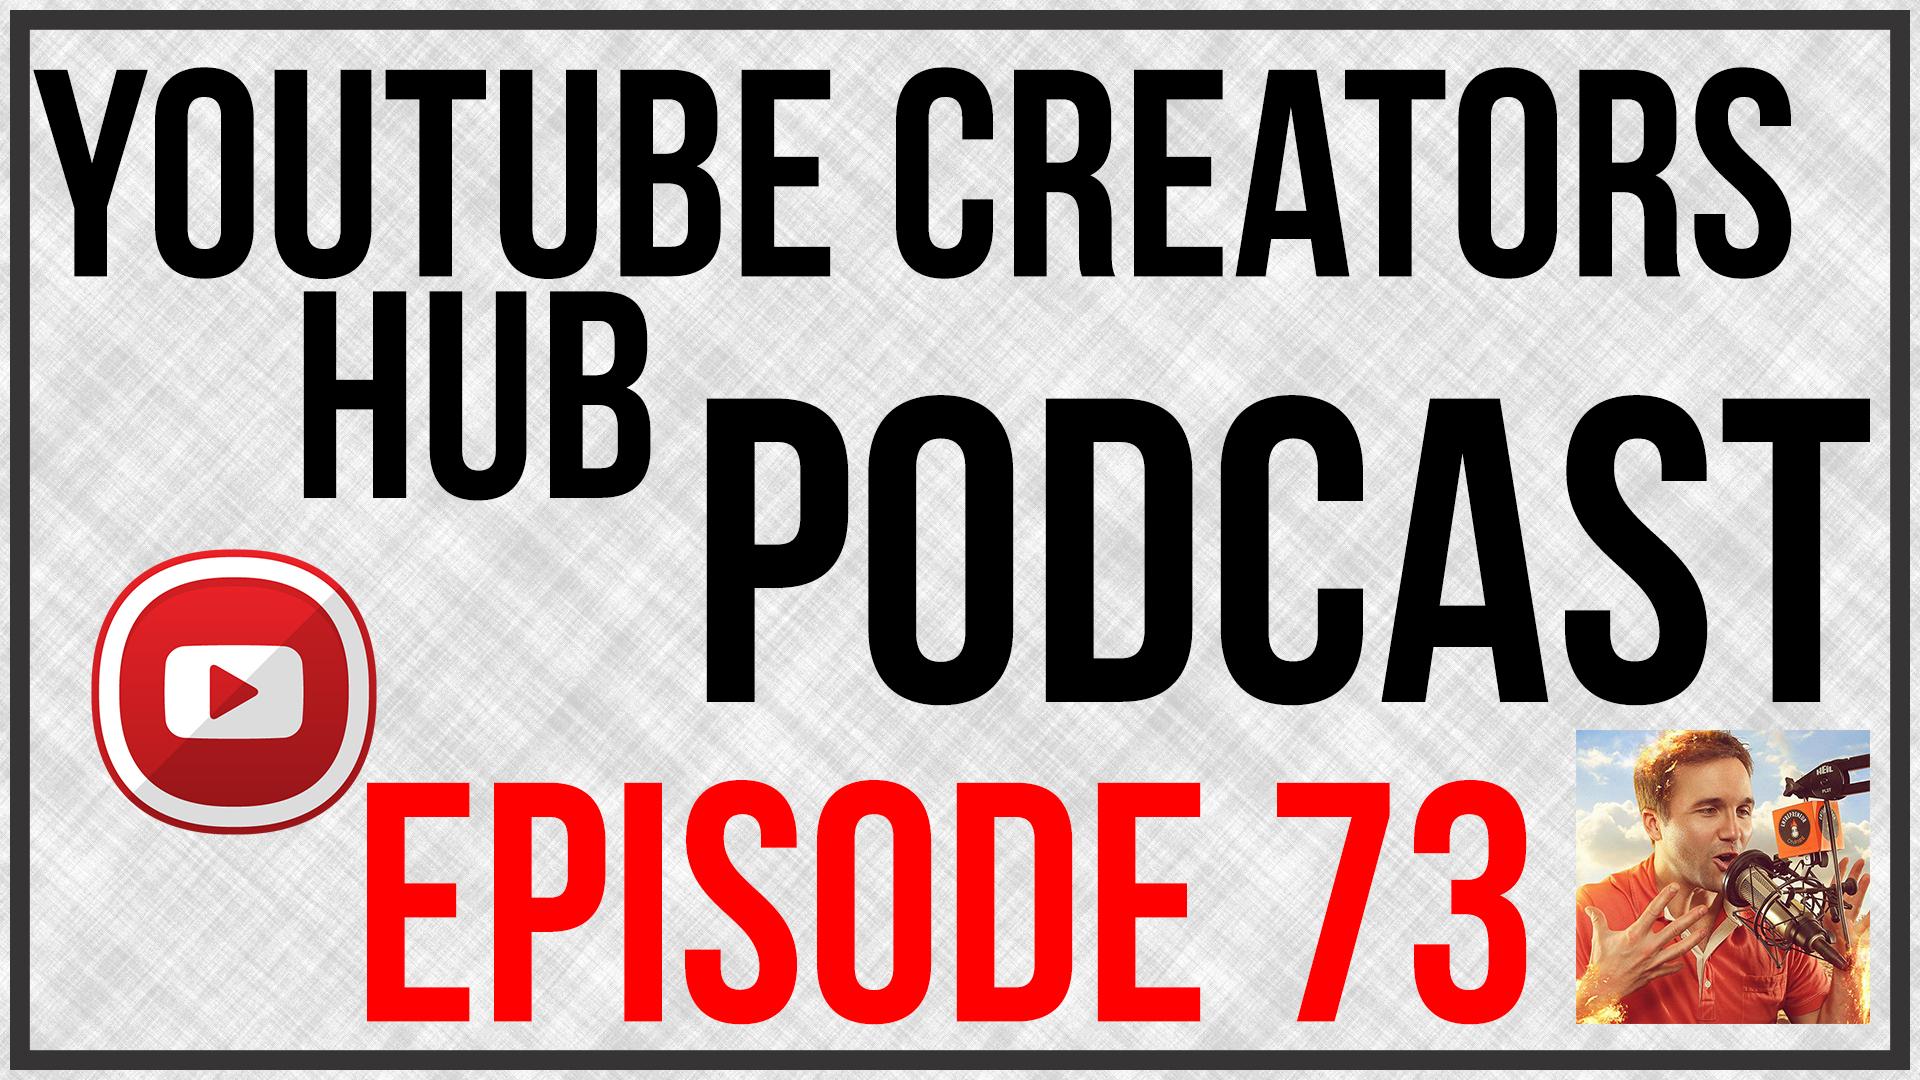 YouTube Creators Hub Podcast Episode 73